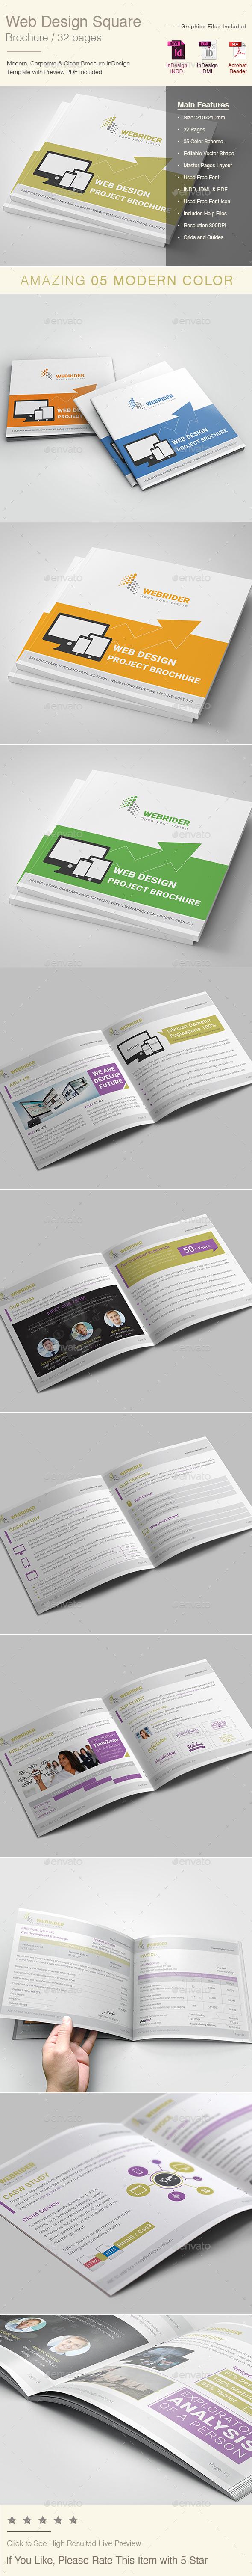 Web Design Square  Brochure Templates - Corporate Brochures